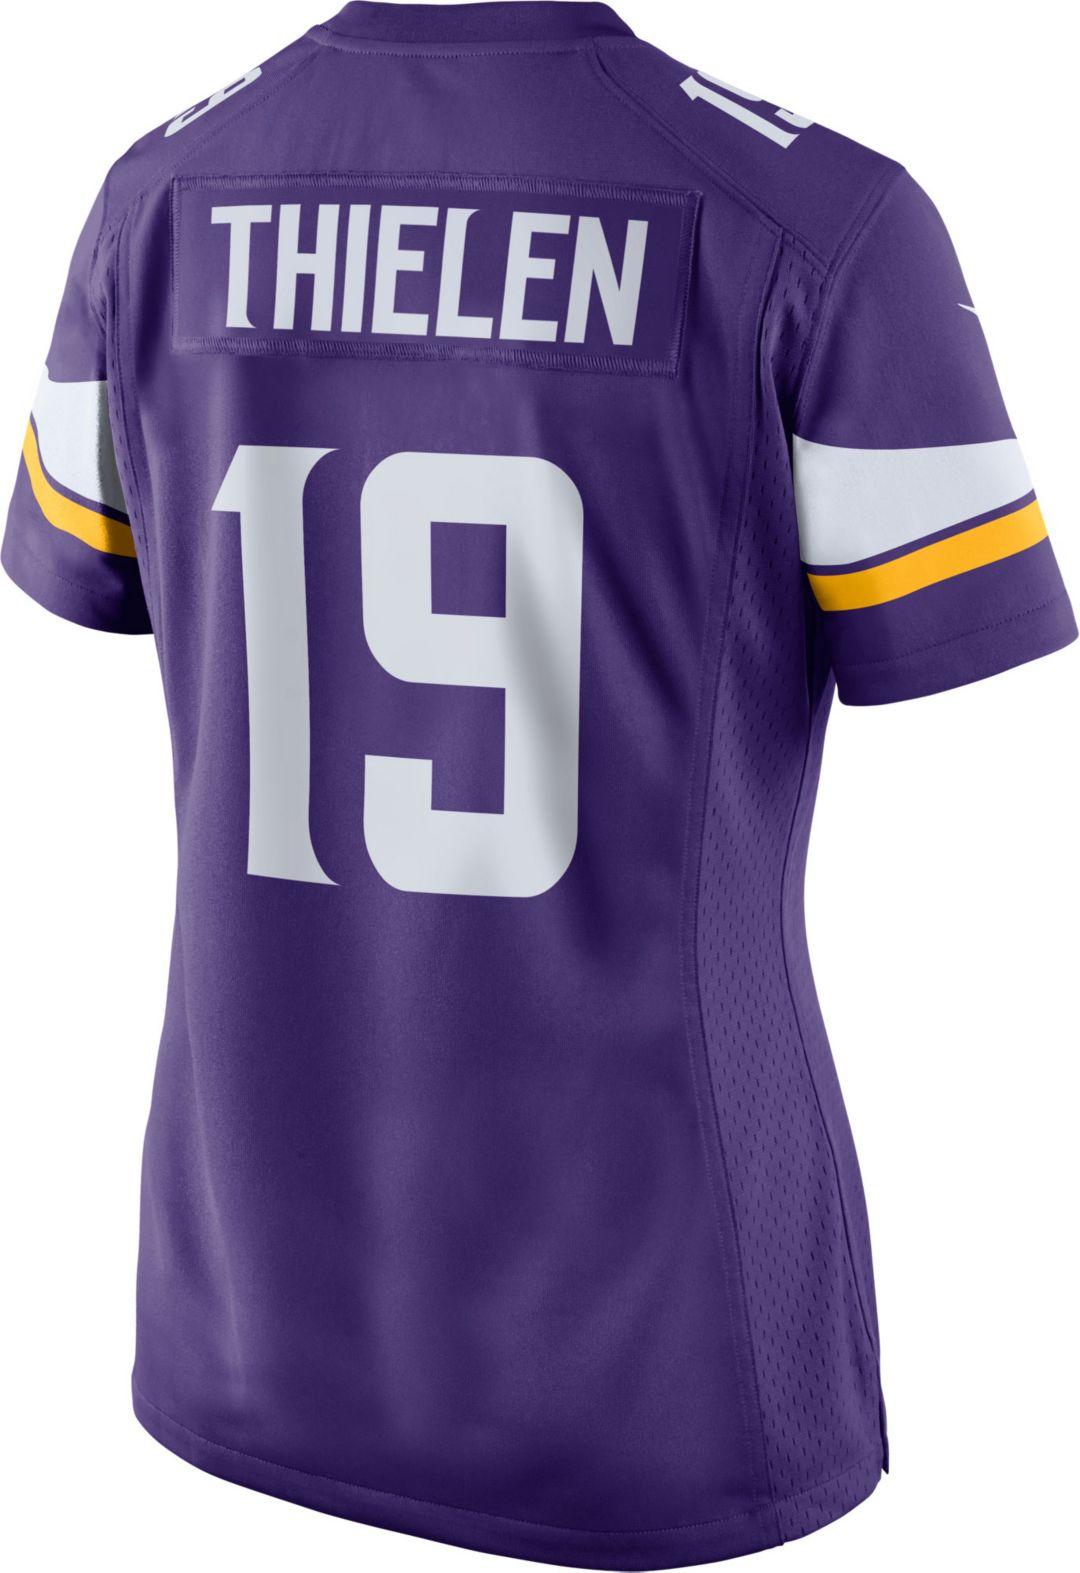 e2231515 Nike Women's Home Game Jersey Minnesota Vikings Adam Thielen #19 ...